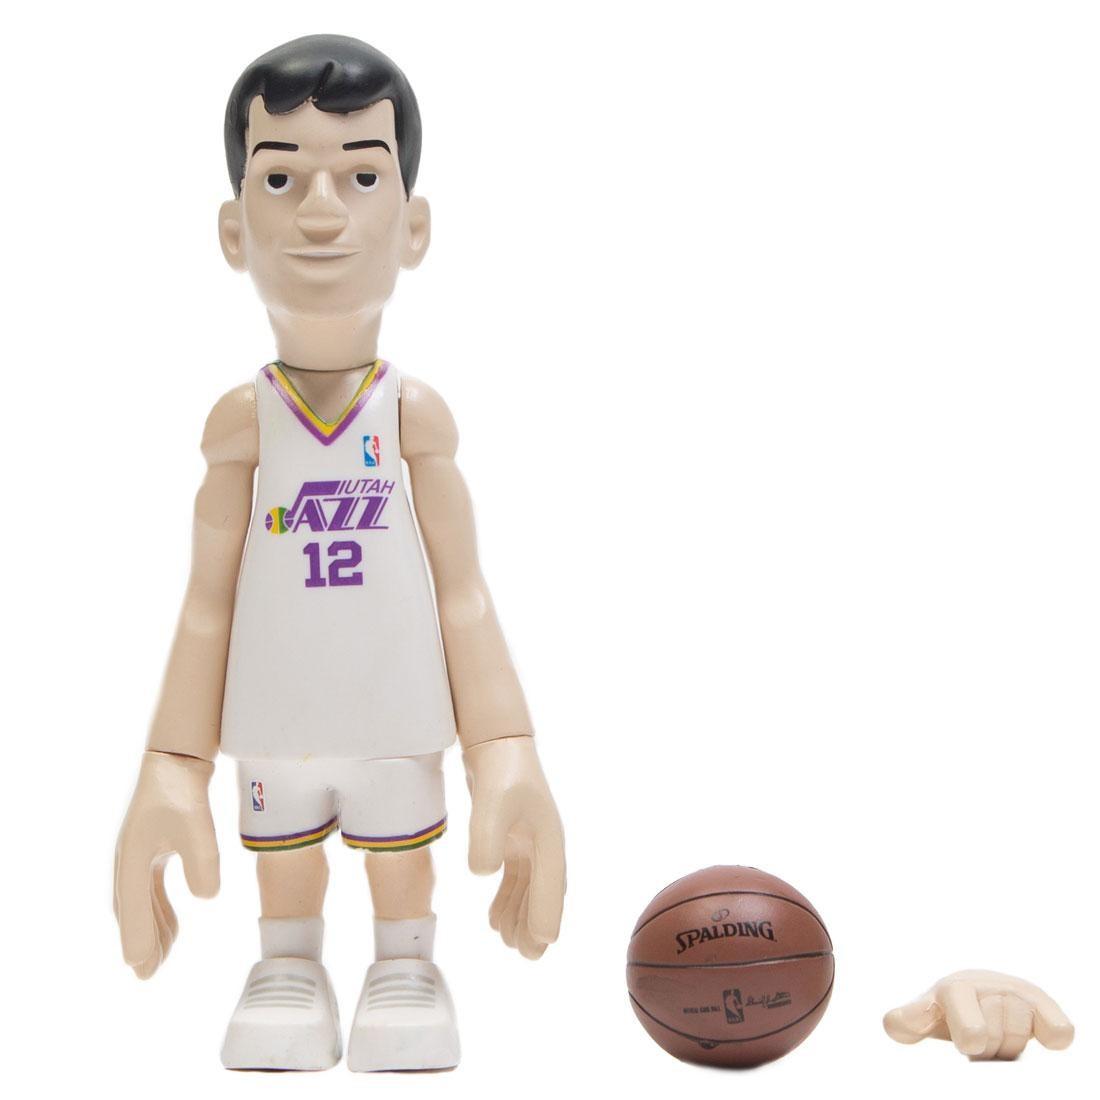 MINDstyle x Coolrain NBA Legends Utah Jazz John Stockton Figure (white)